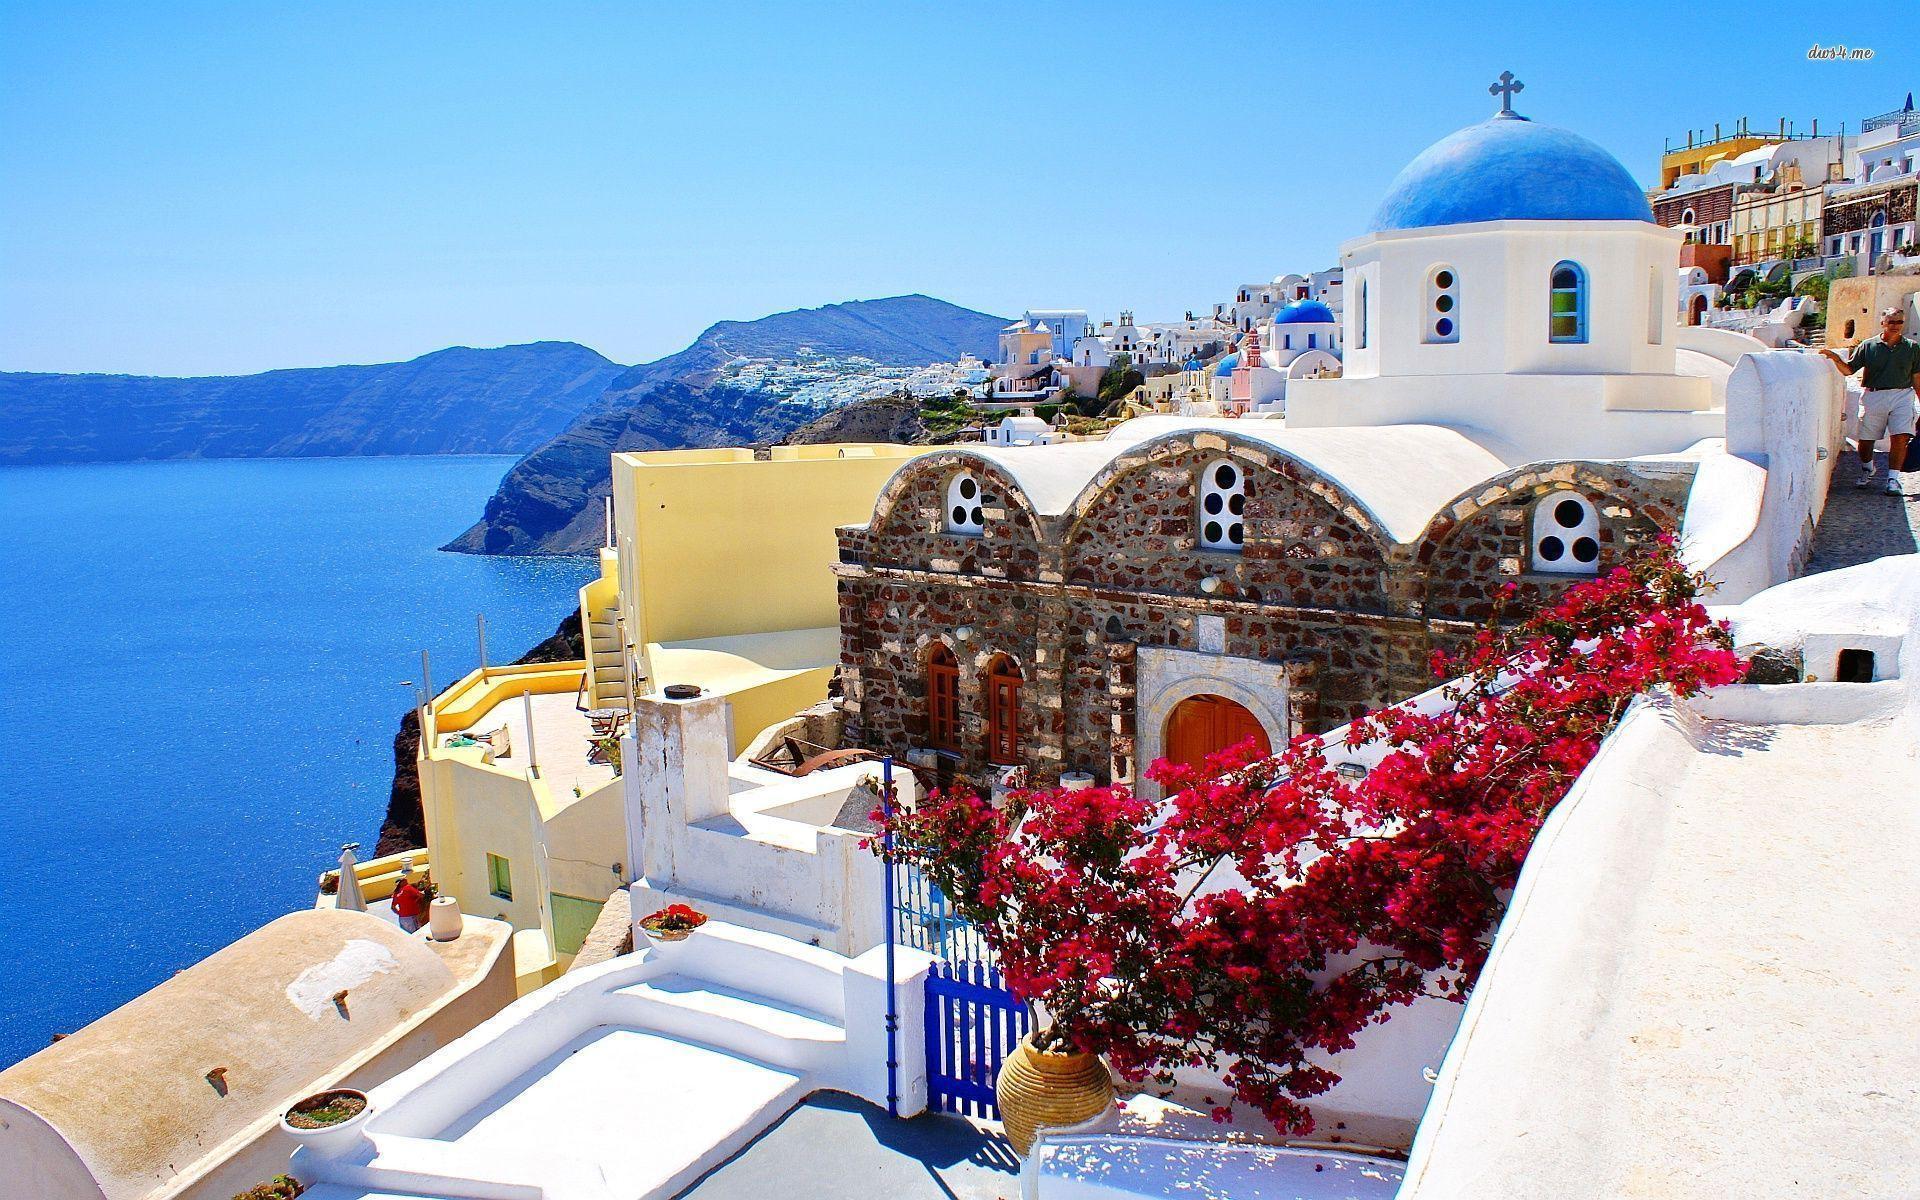 wallpaper santorini greece island - photo #2